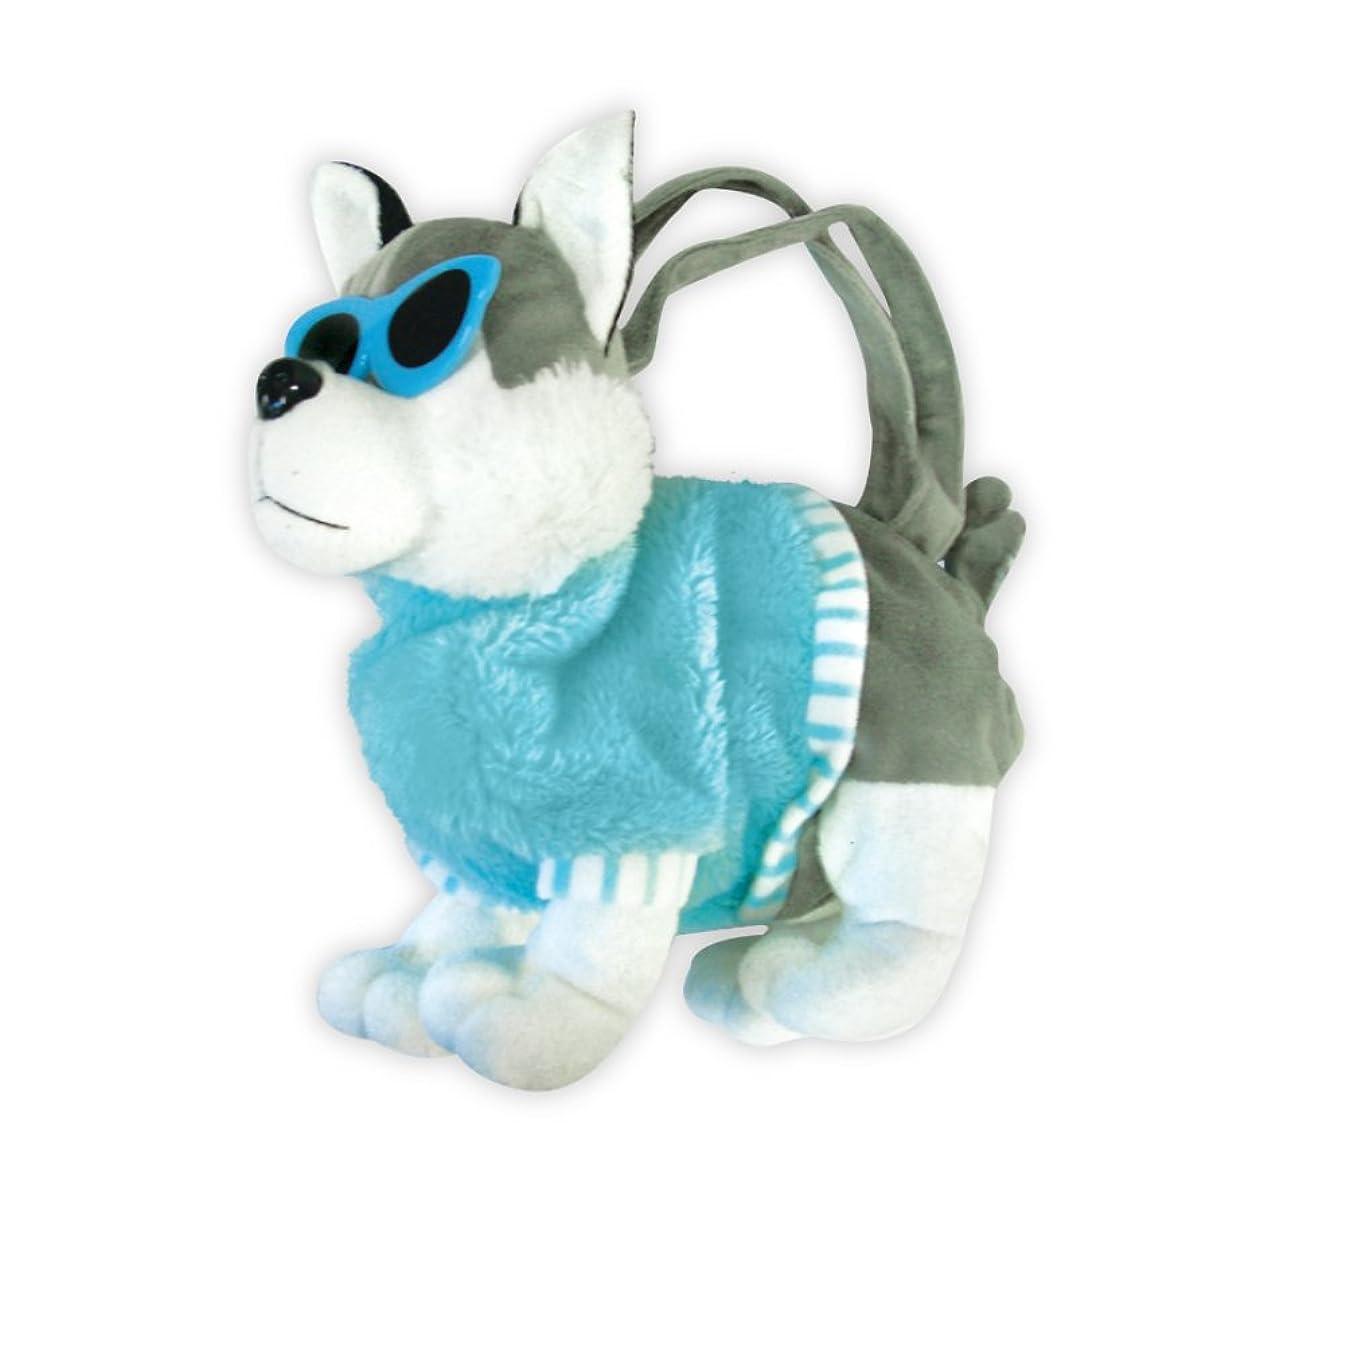 Rockin Bag Pals Kids Handbag - Plush Poodle Dog with Sunglasses Cute Handbag (Blue)